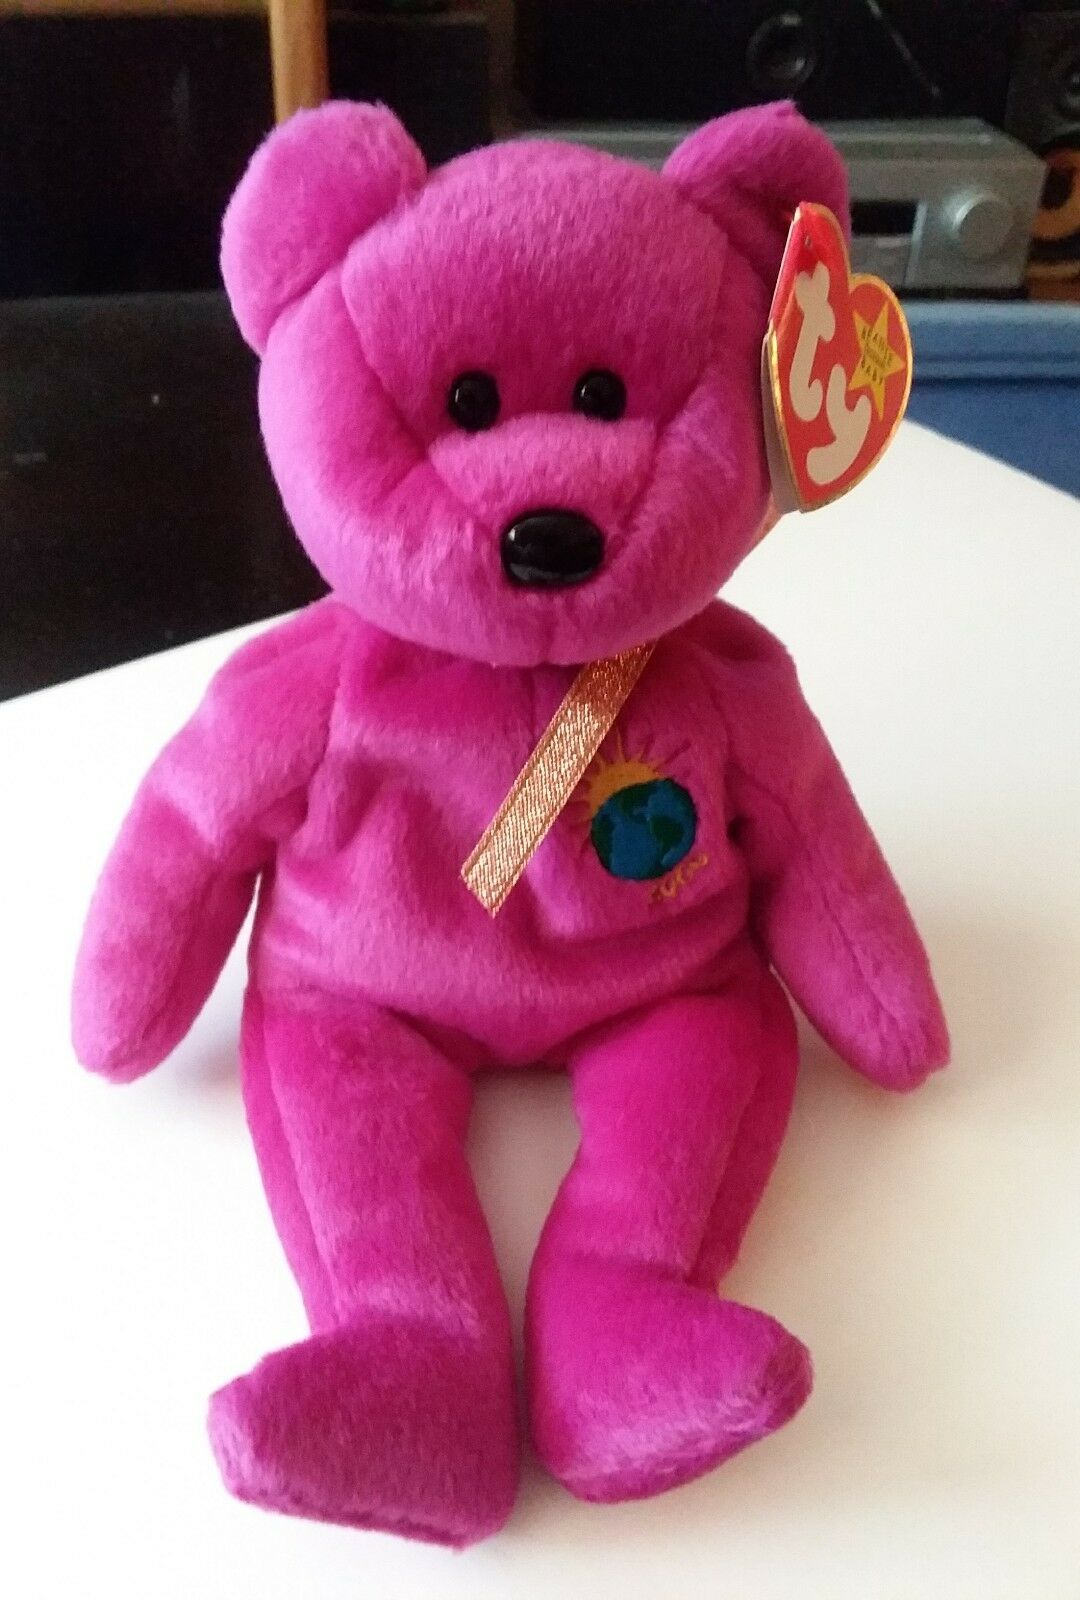 8421557bfaf Millenium Ty Beanie Baby with errors VERY RARE (Millennium) Bear ...